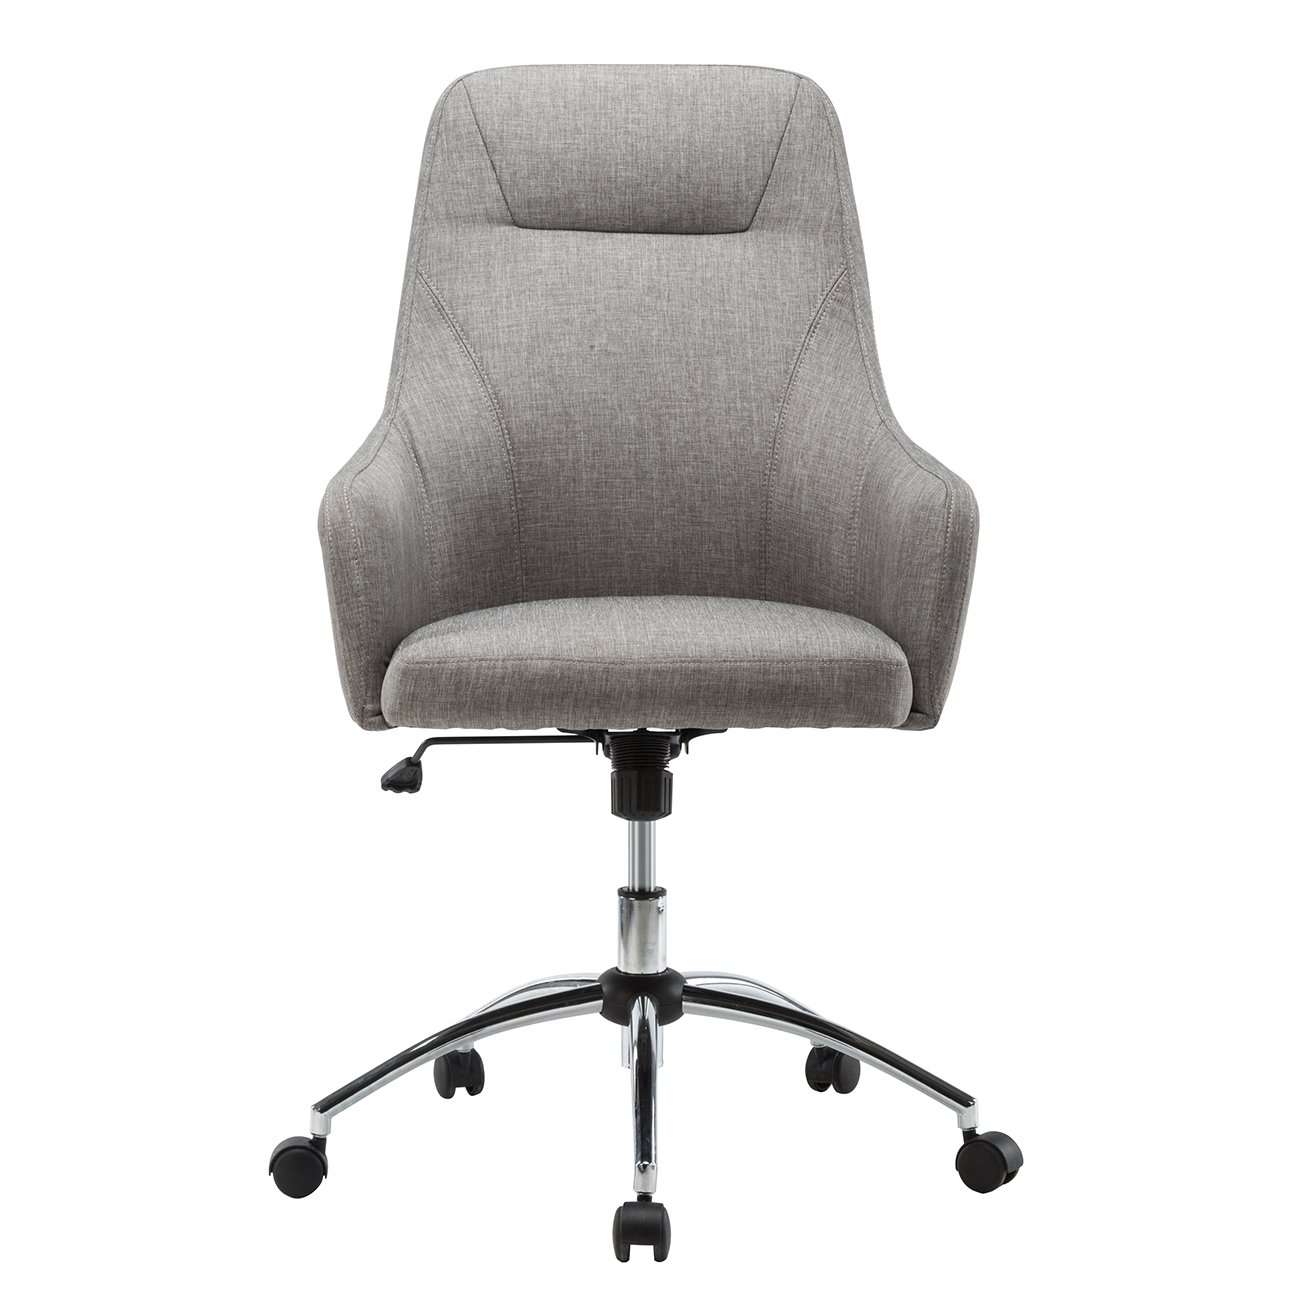 Etonnant Amazon.com: Techni Mobili Comfy Height Adjustable Rolling Office Desk Chair  W/Wheels: Kitchen U0026 Dining